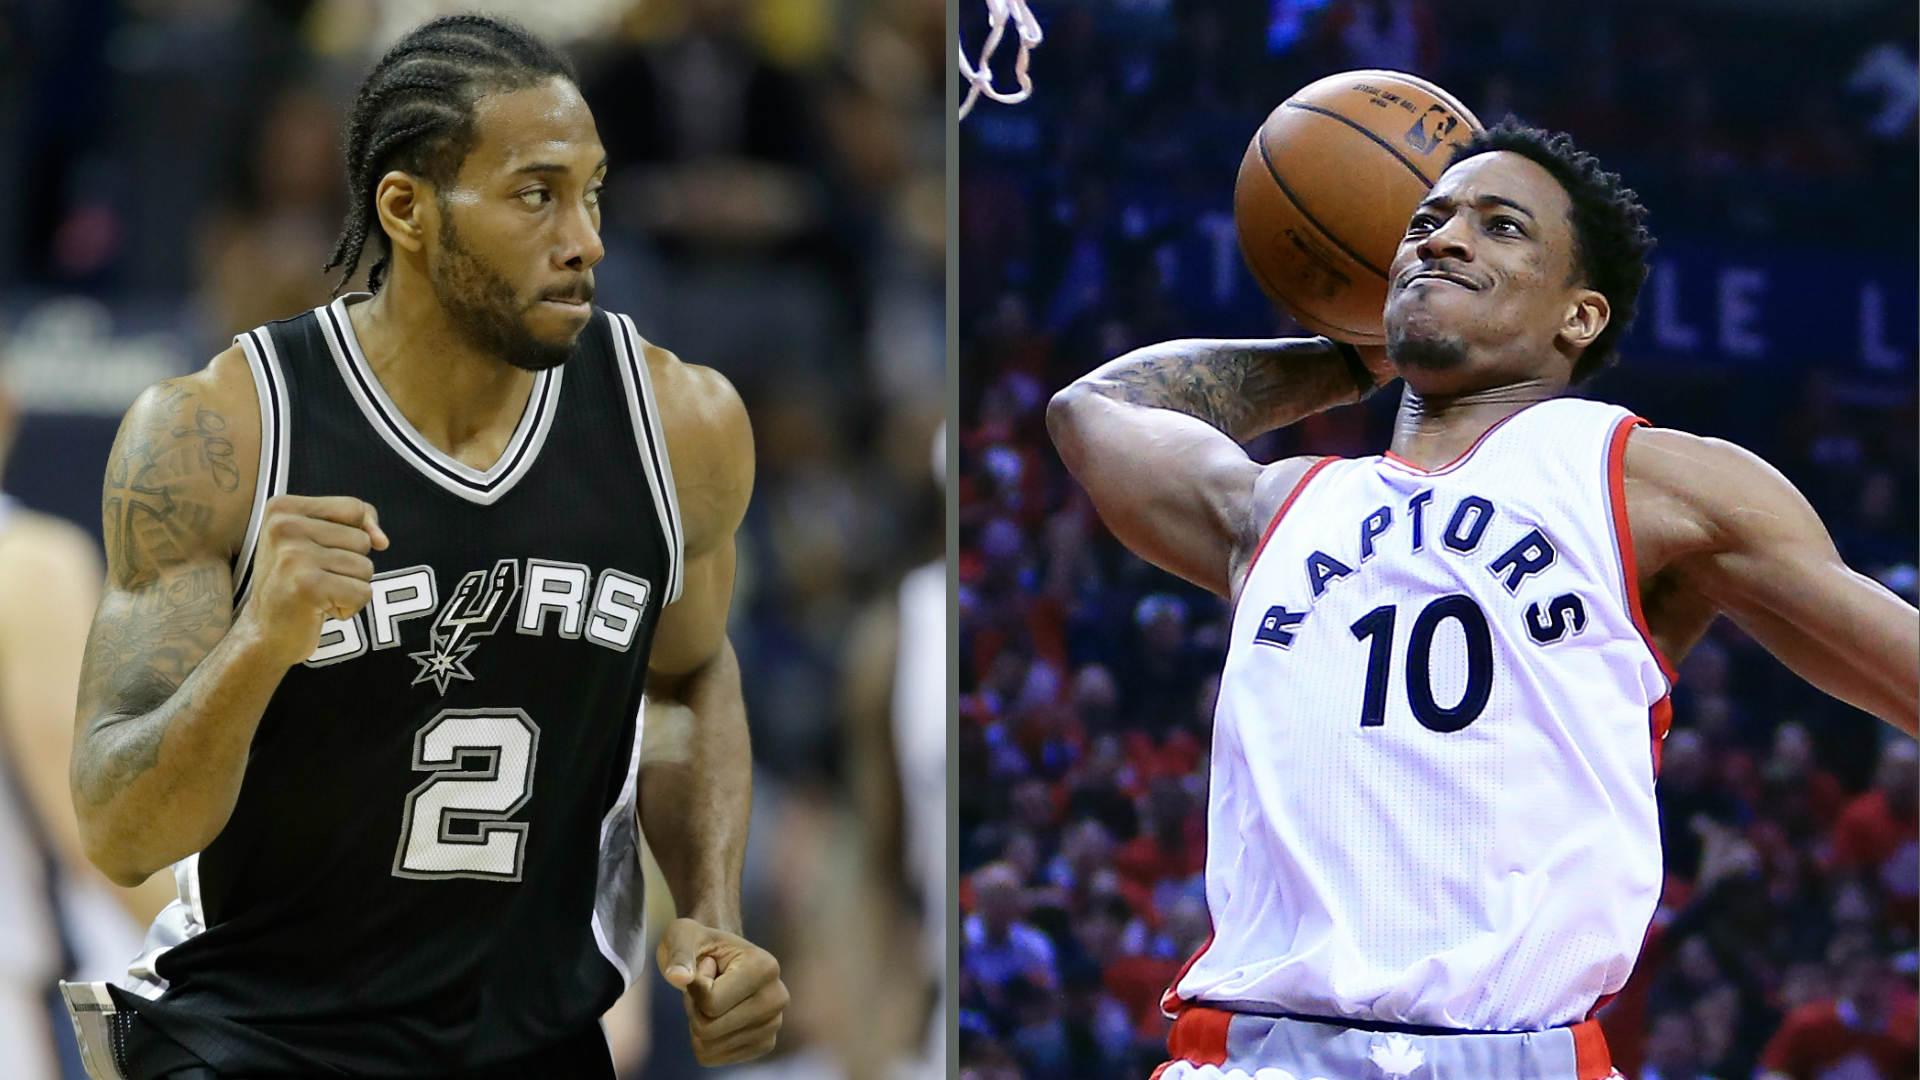 Kawhi Leonard traded to Raptors as DeMar DeRozan heads to Spurs